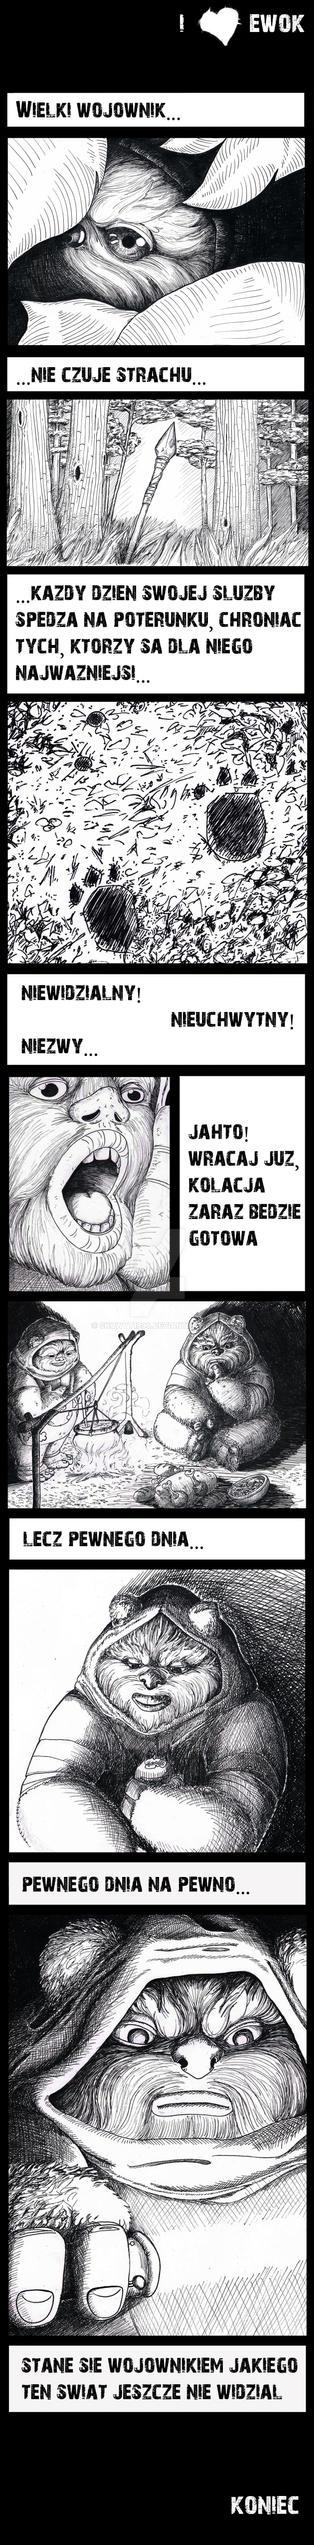 ewok by skowyt1990